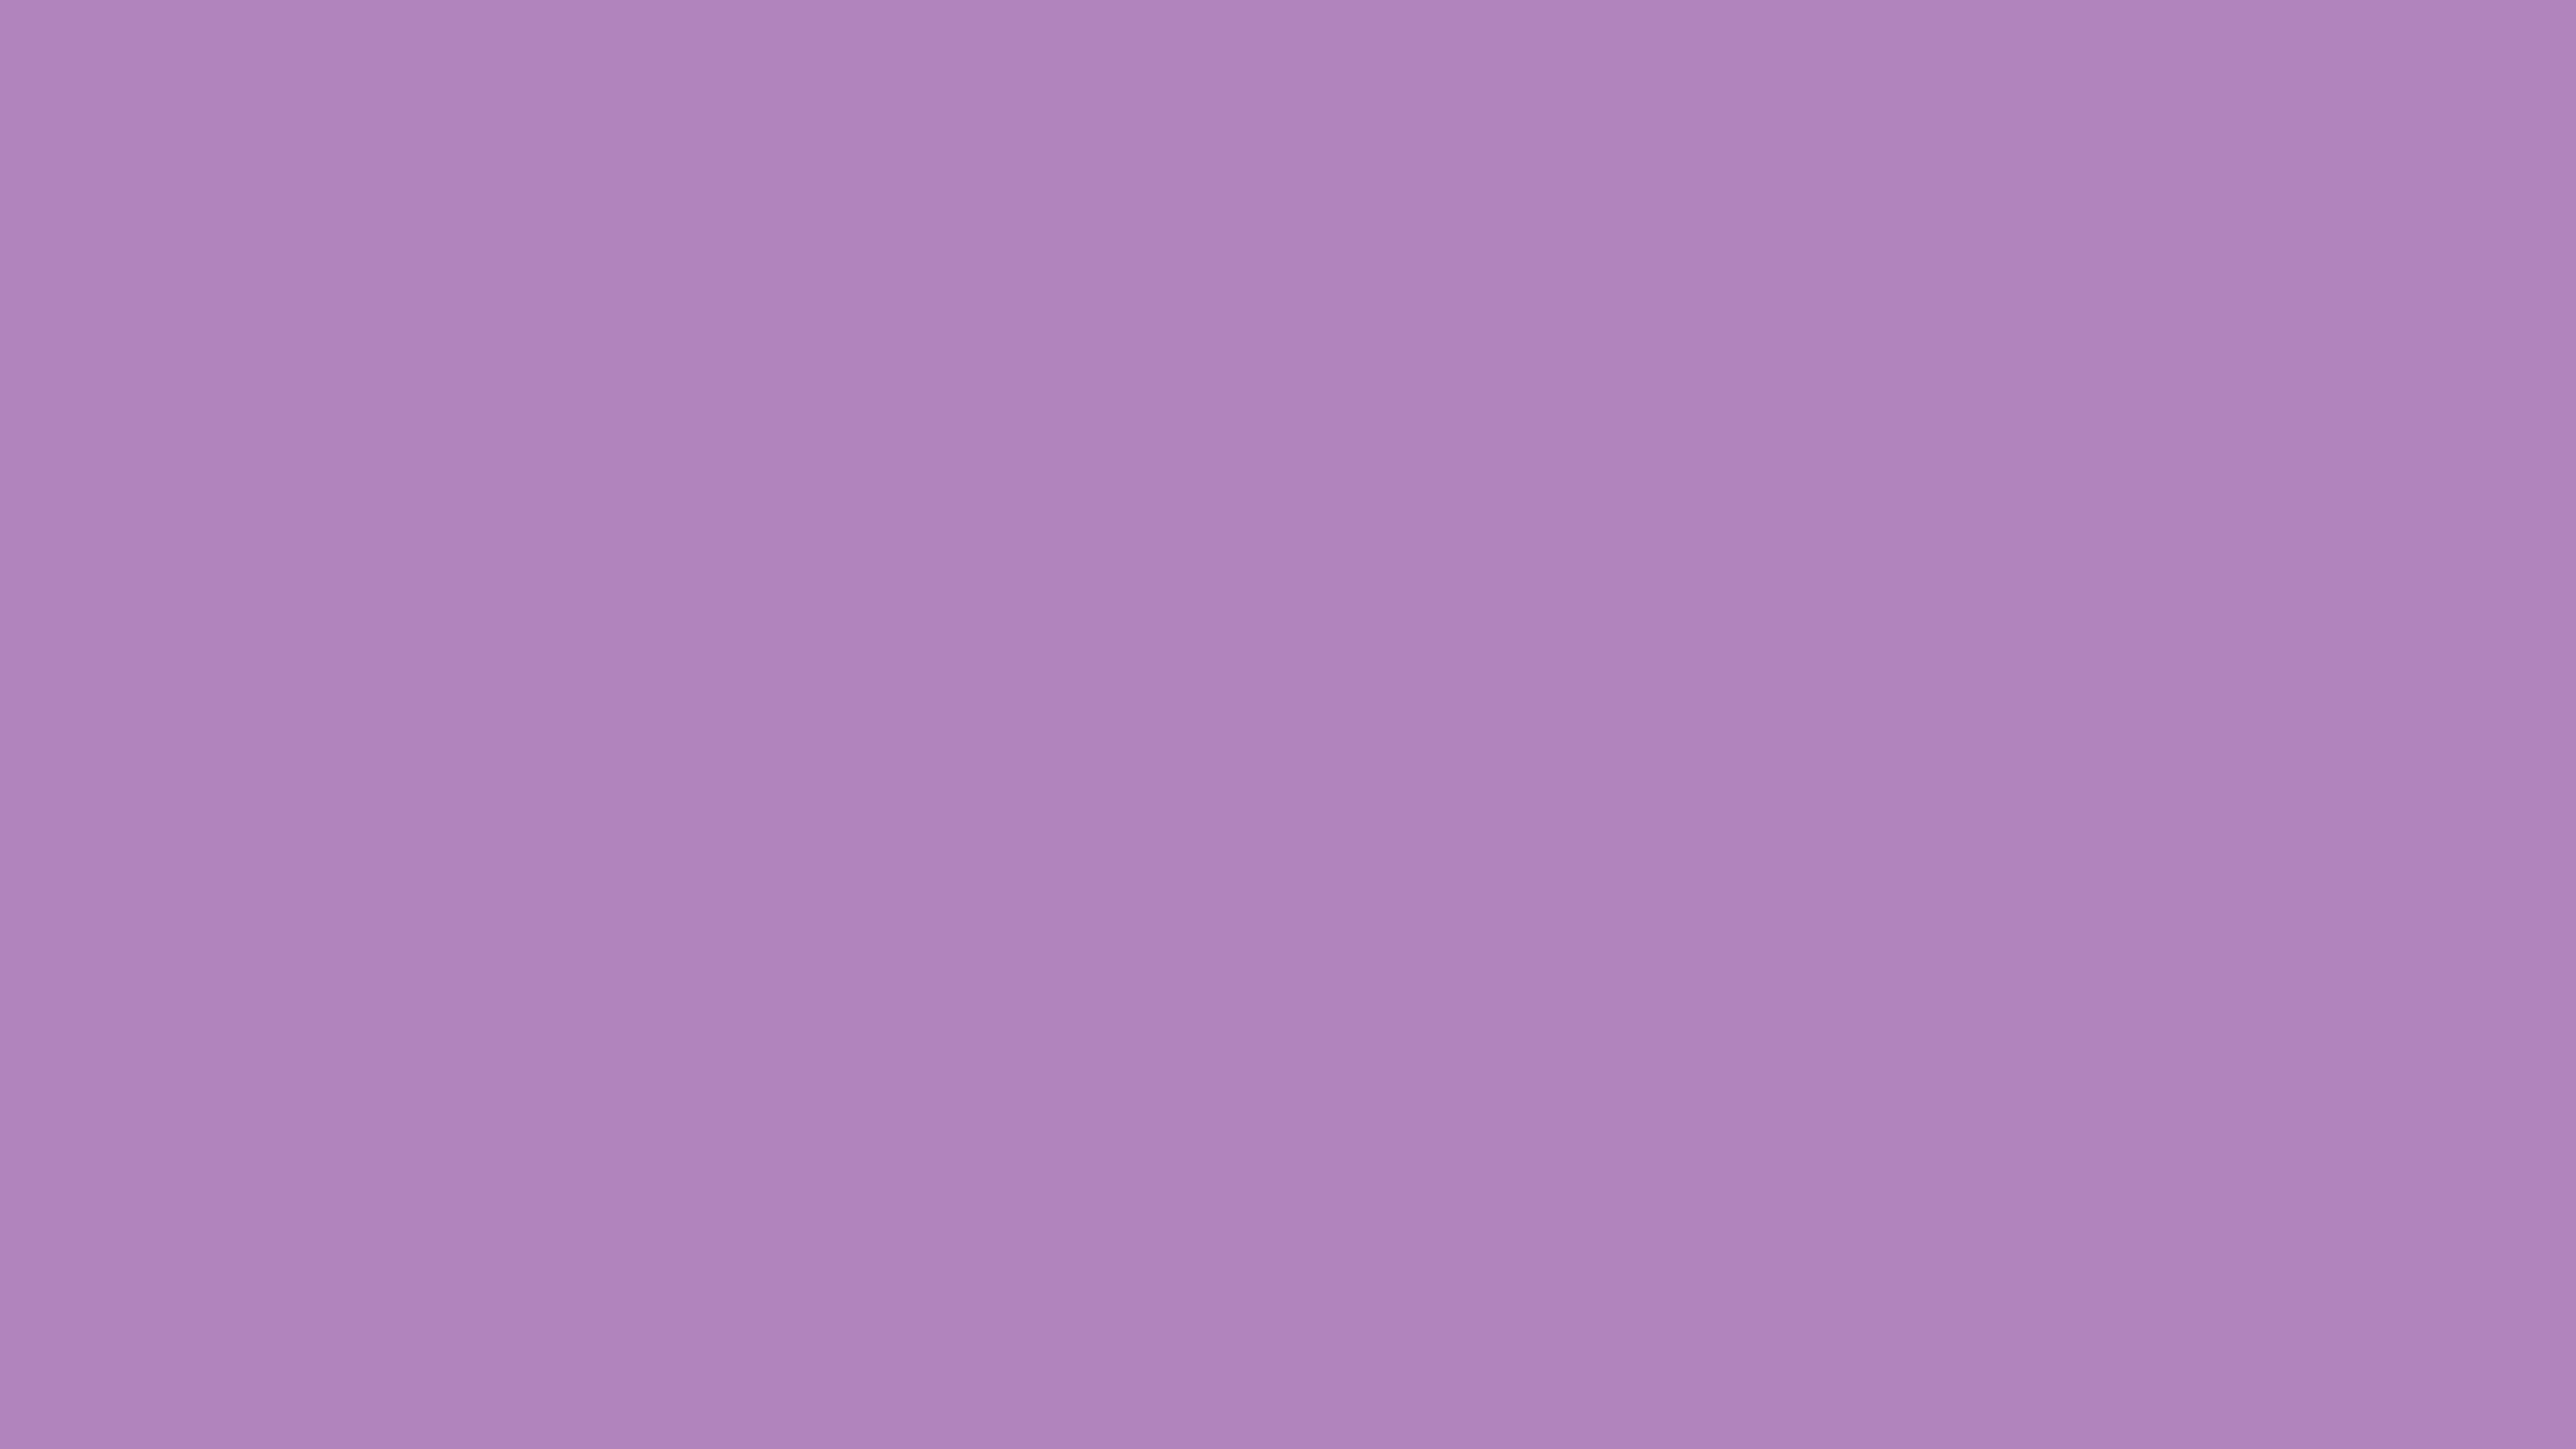 3840x2160 African Violet Solid Color Background